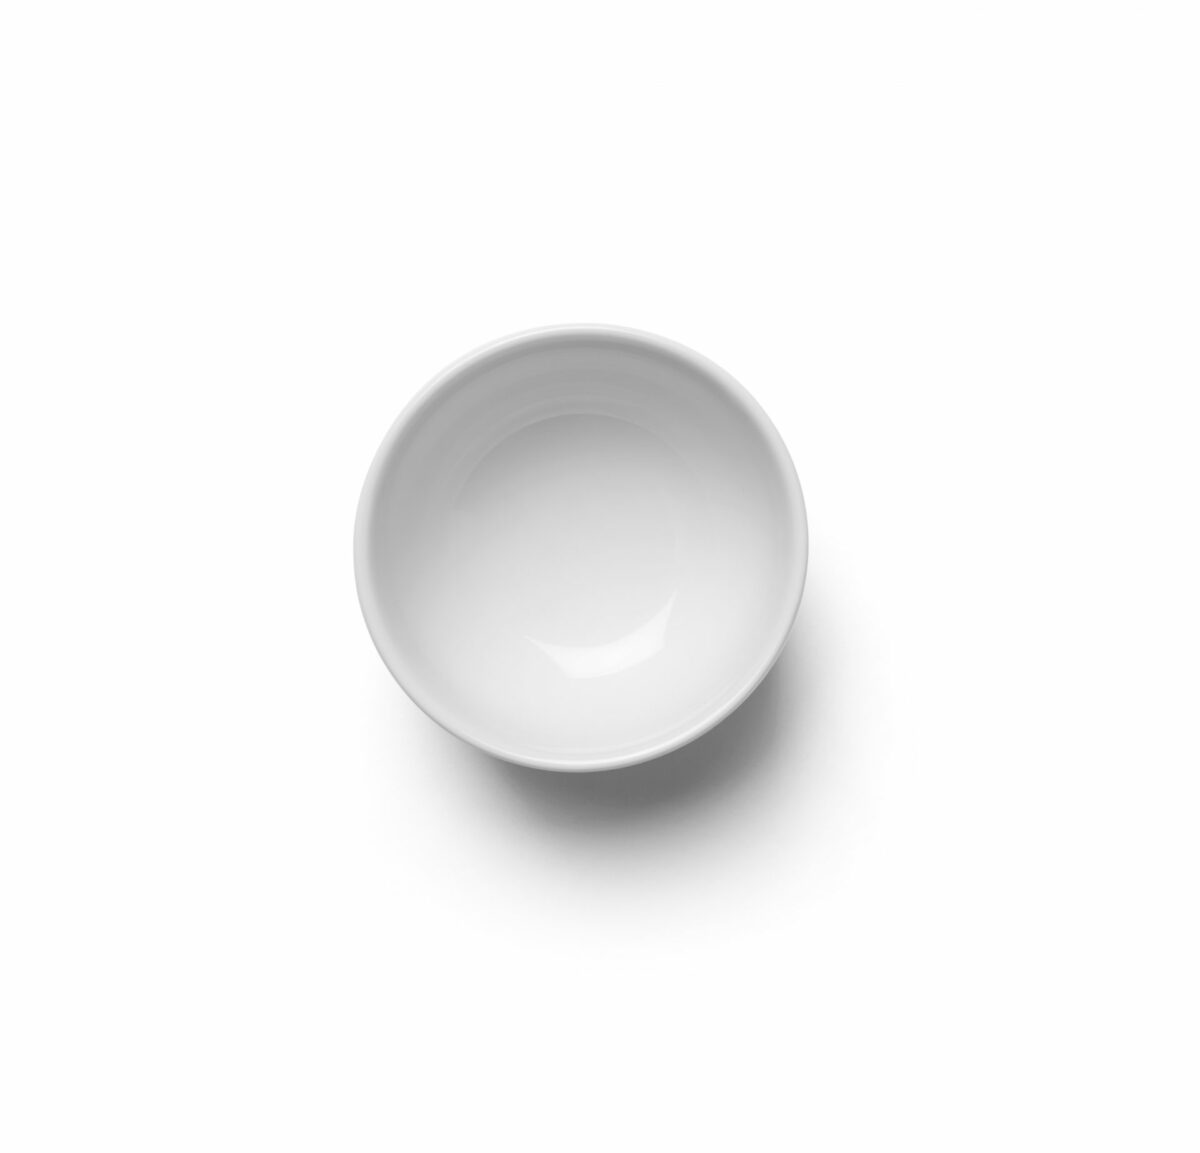 2033630 New Norm Bowl O75 cm White Norm 02